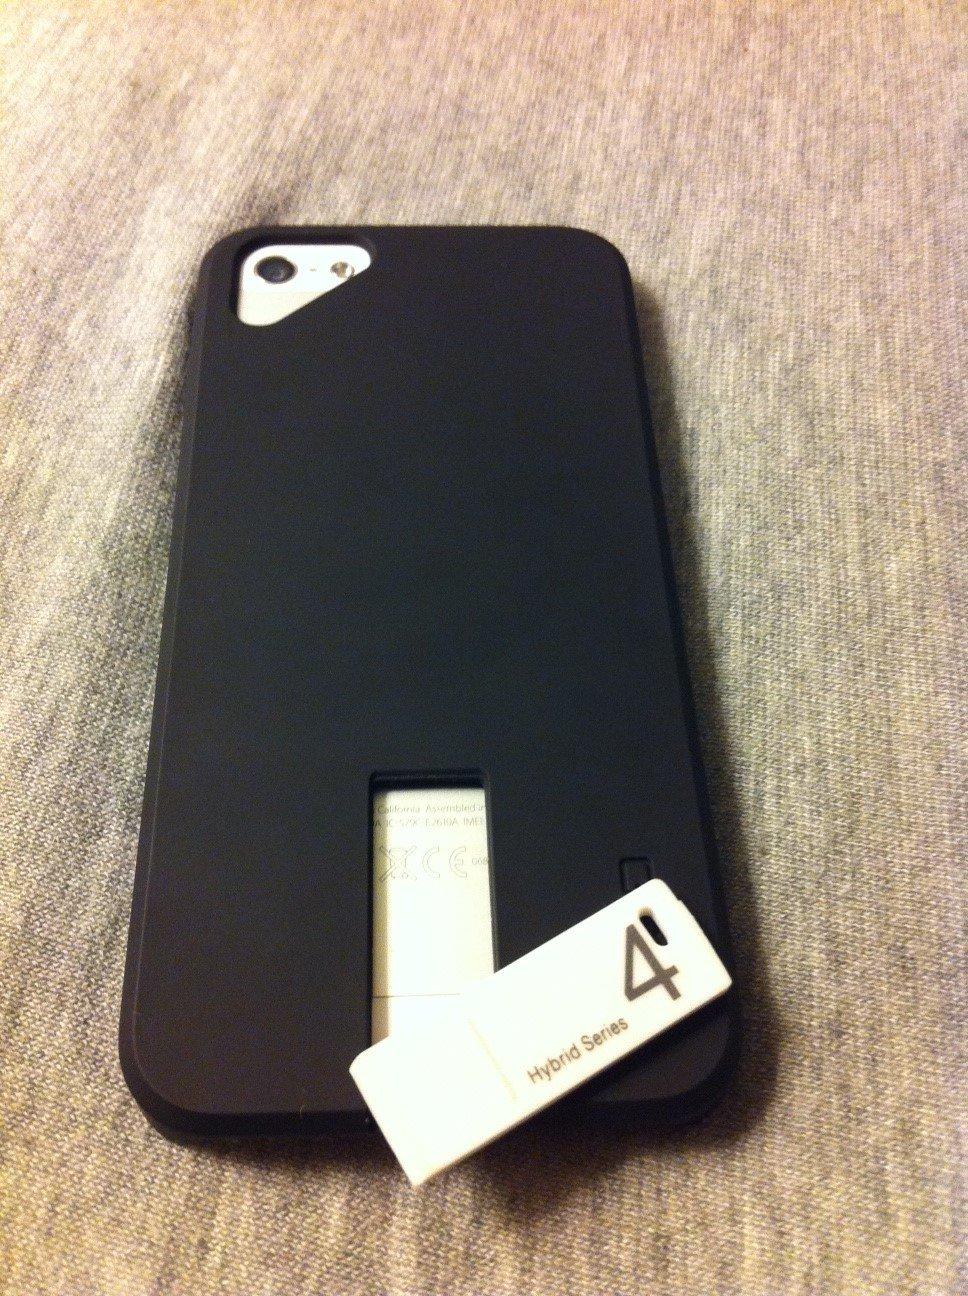 coque iphone 5 cle usb - Test : Ego, la coque iPhone 5 Clé USB